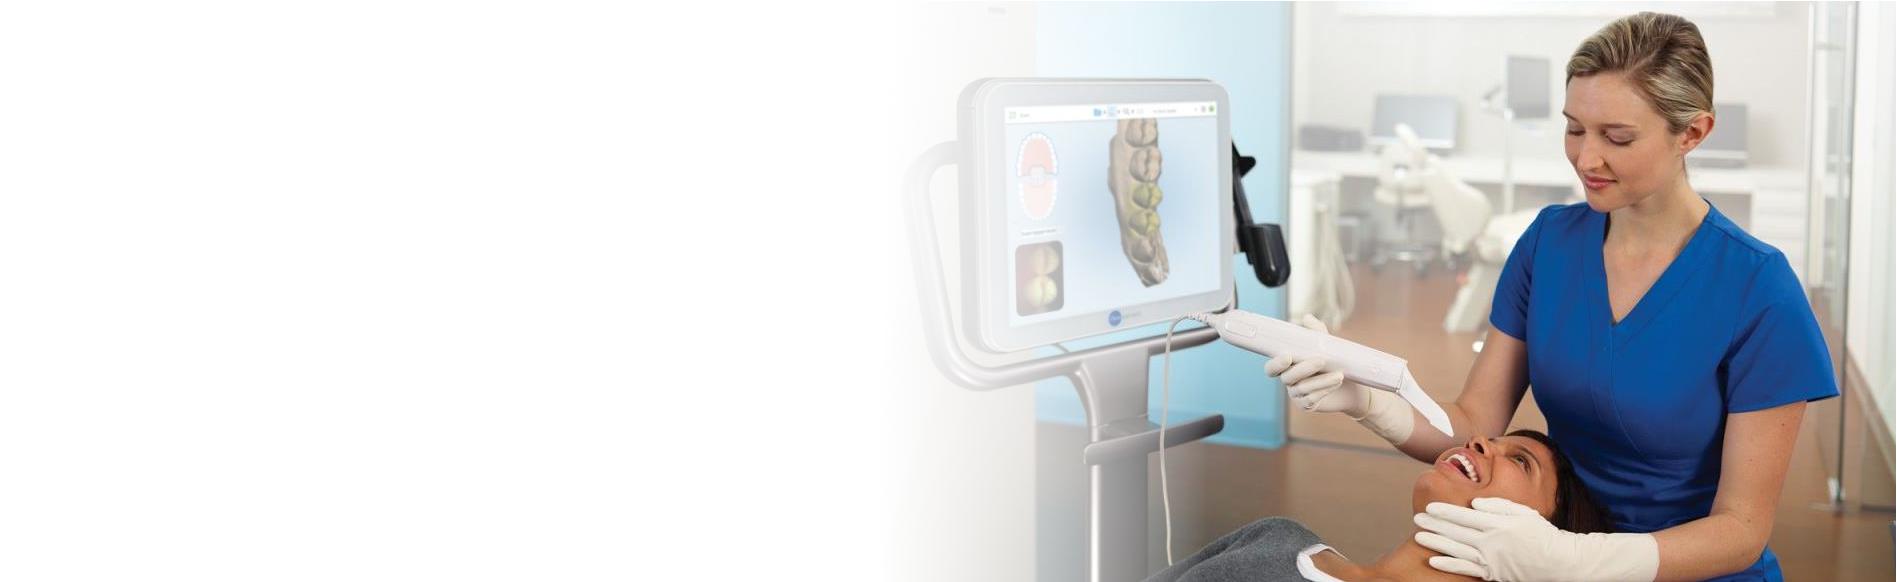 Skaner wewnątrzustny / Intraoral scanner